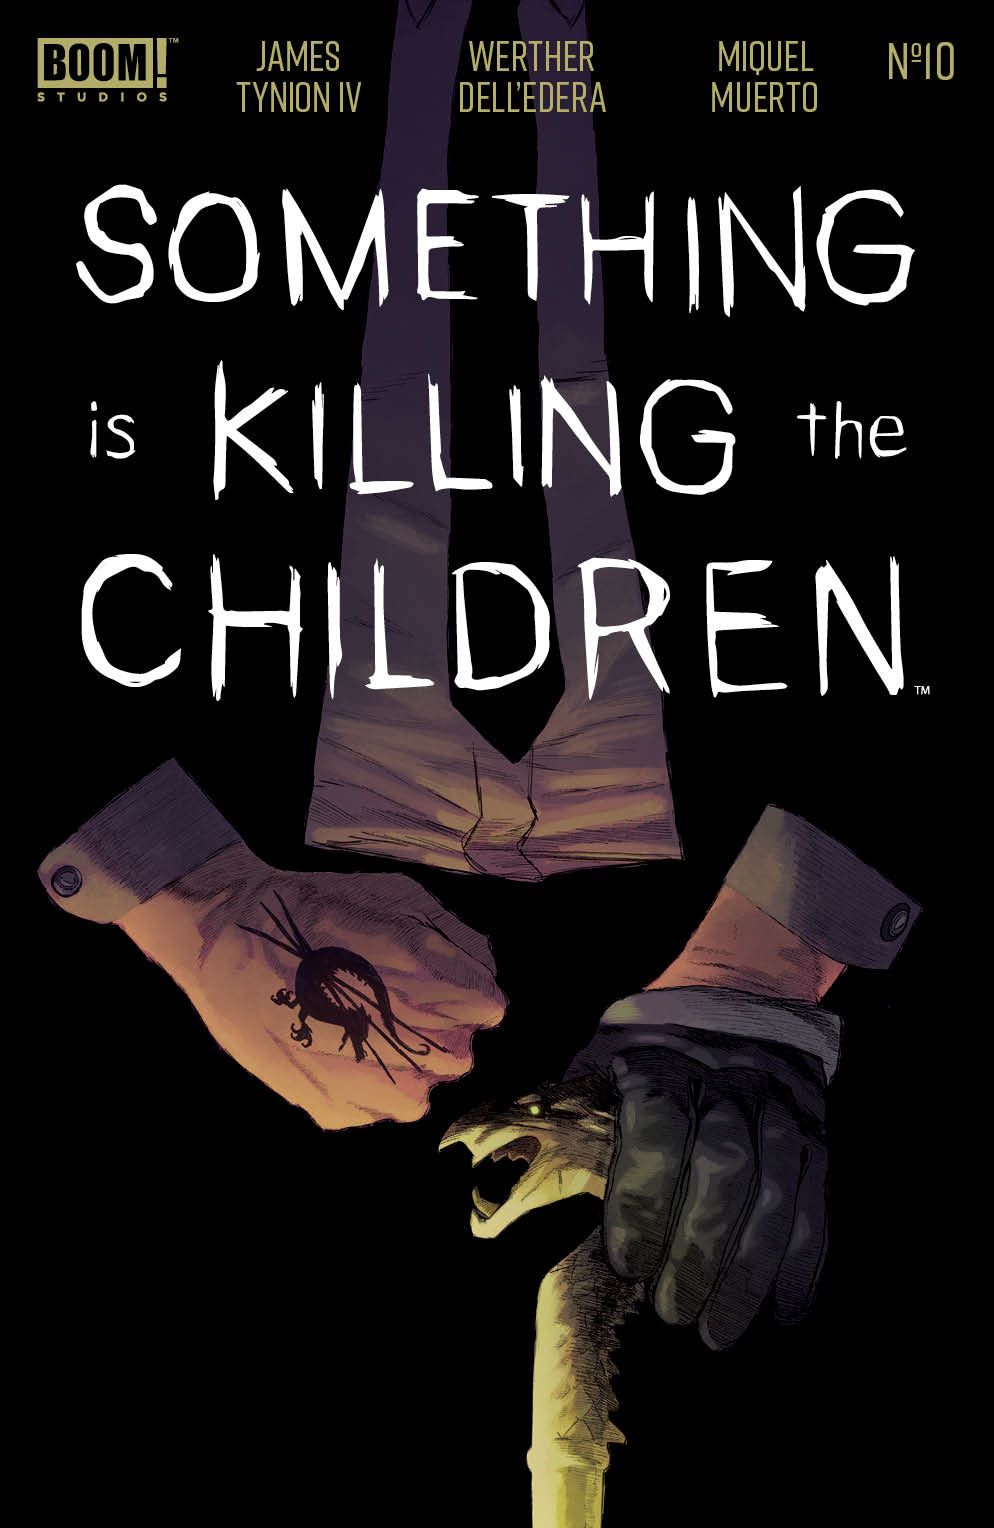 SomethingKillingChildren_010_Cover_Main ComicList: BOOM! Studios New Releases for 09/09/2020